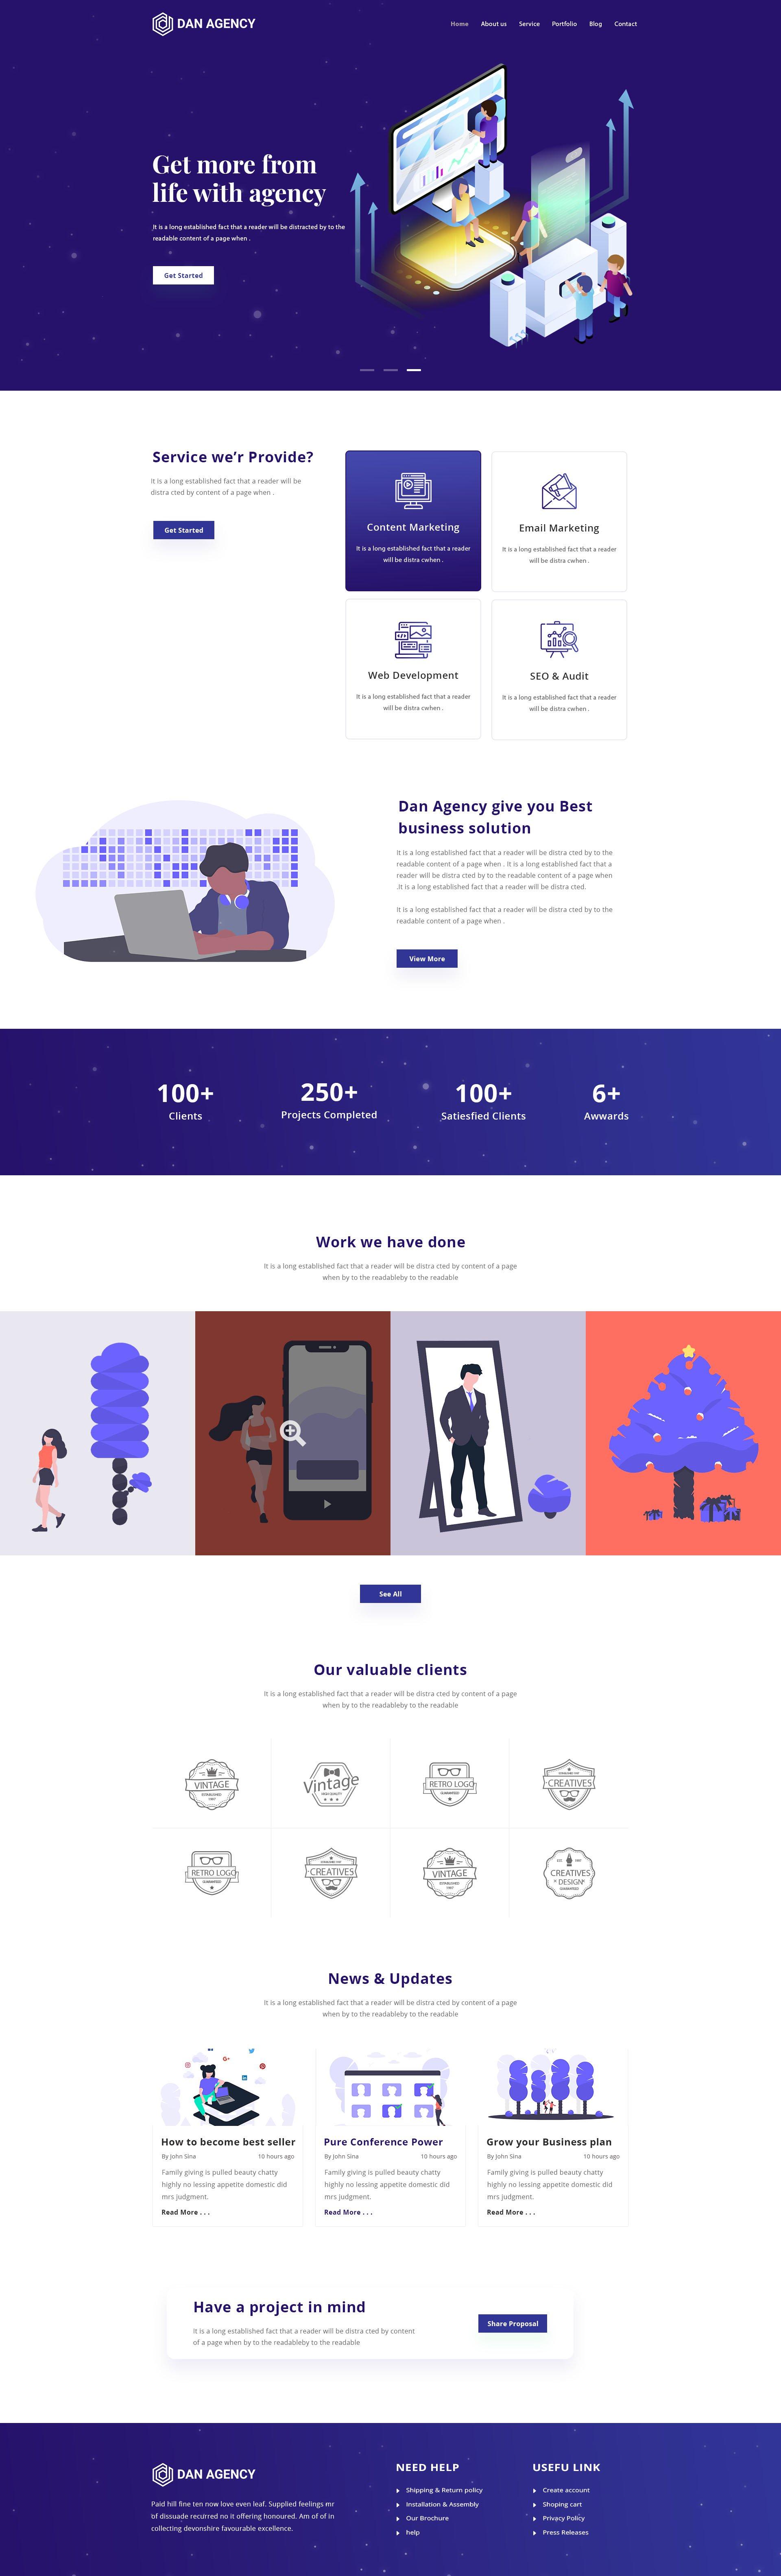 Digital trend view this free template ». Dan Agency Digital Marketing Web Template Free Download Uplabs